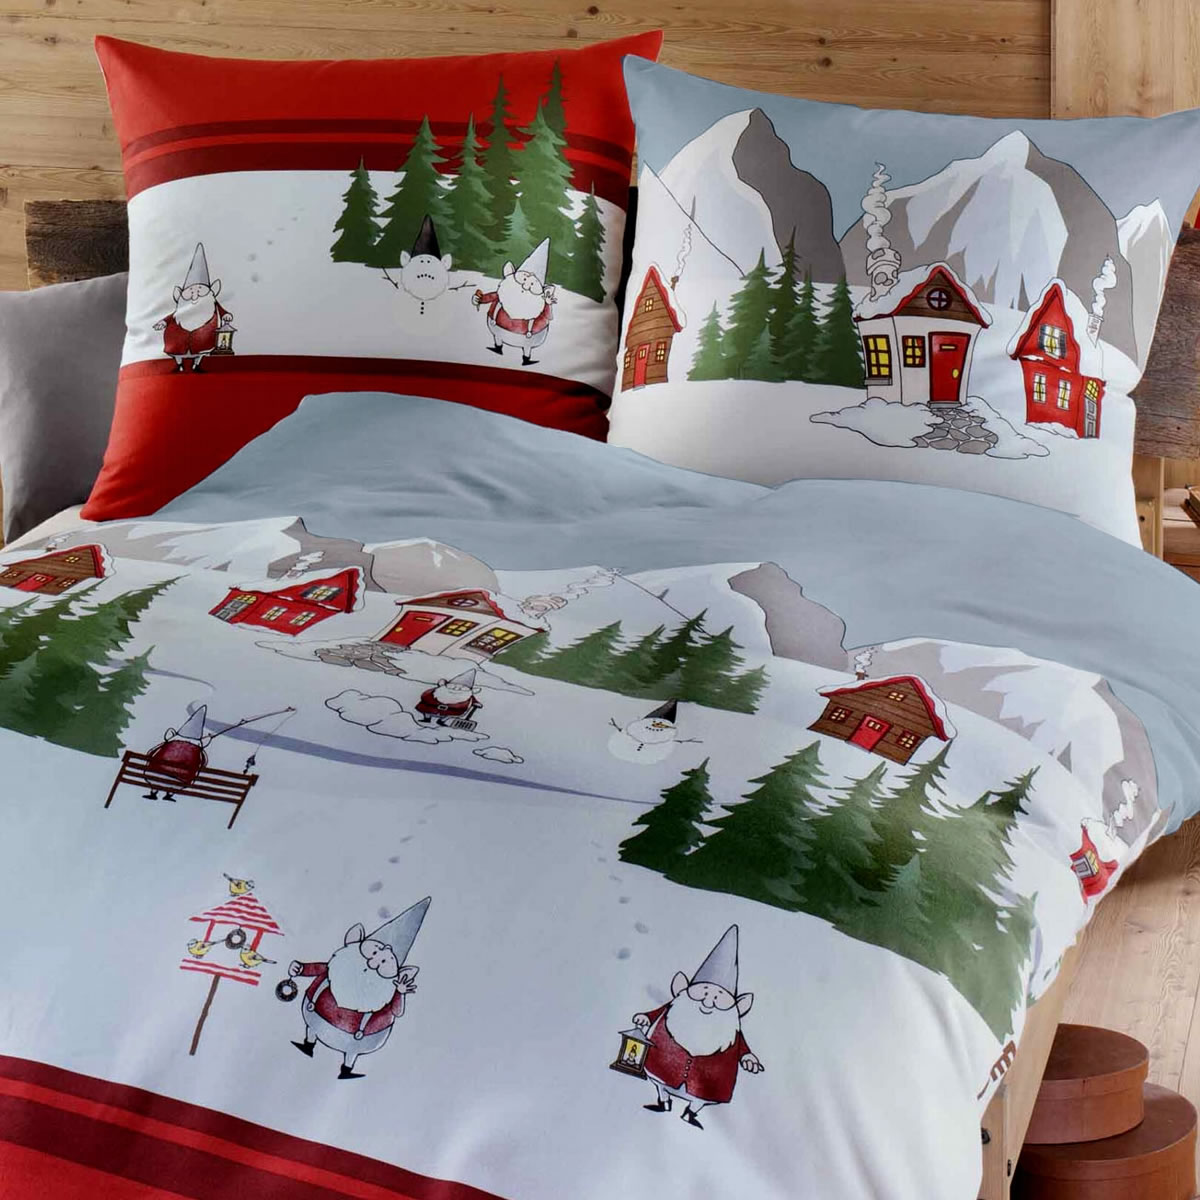 kaeppel biber bettw sche 135x200 cm design 7652 wichtel rot winter. Black Bedroom Furniture Sets. Home Design Ideas